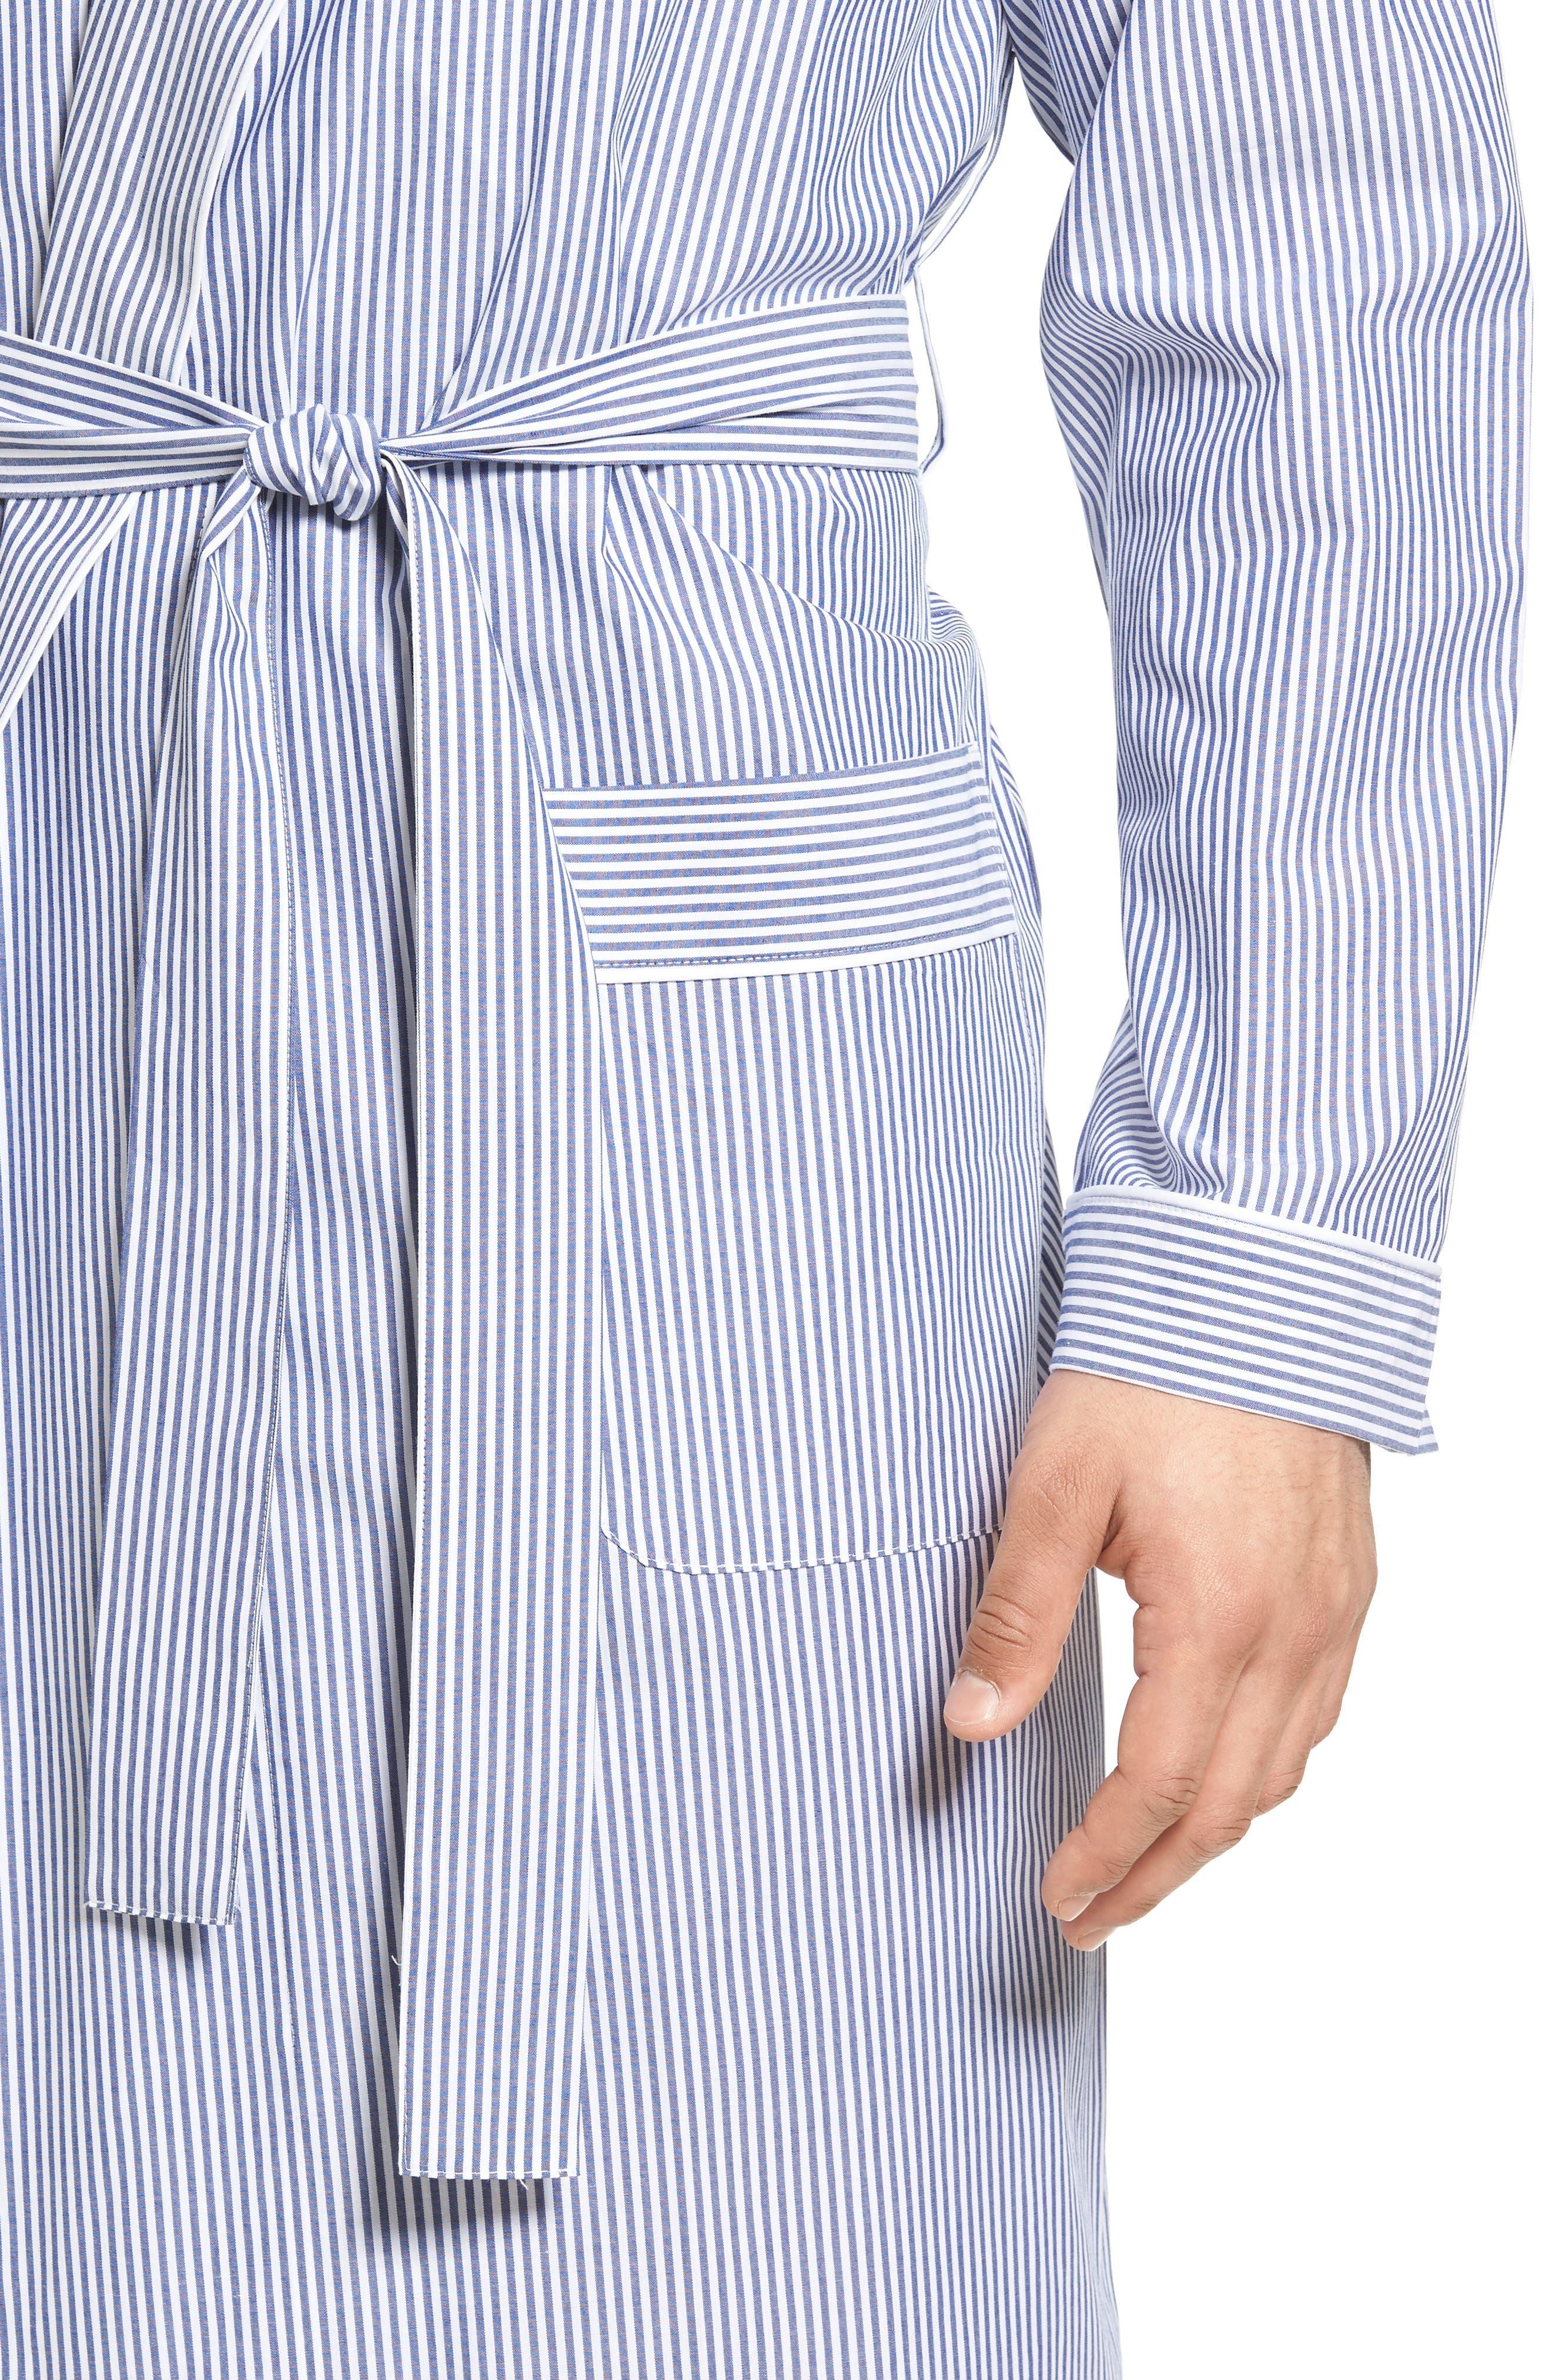 Bengal Stripe Robe,                             Alternate thumbnail 4, color,                             NAVY/ WHITE